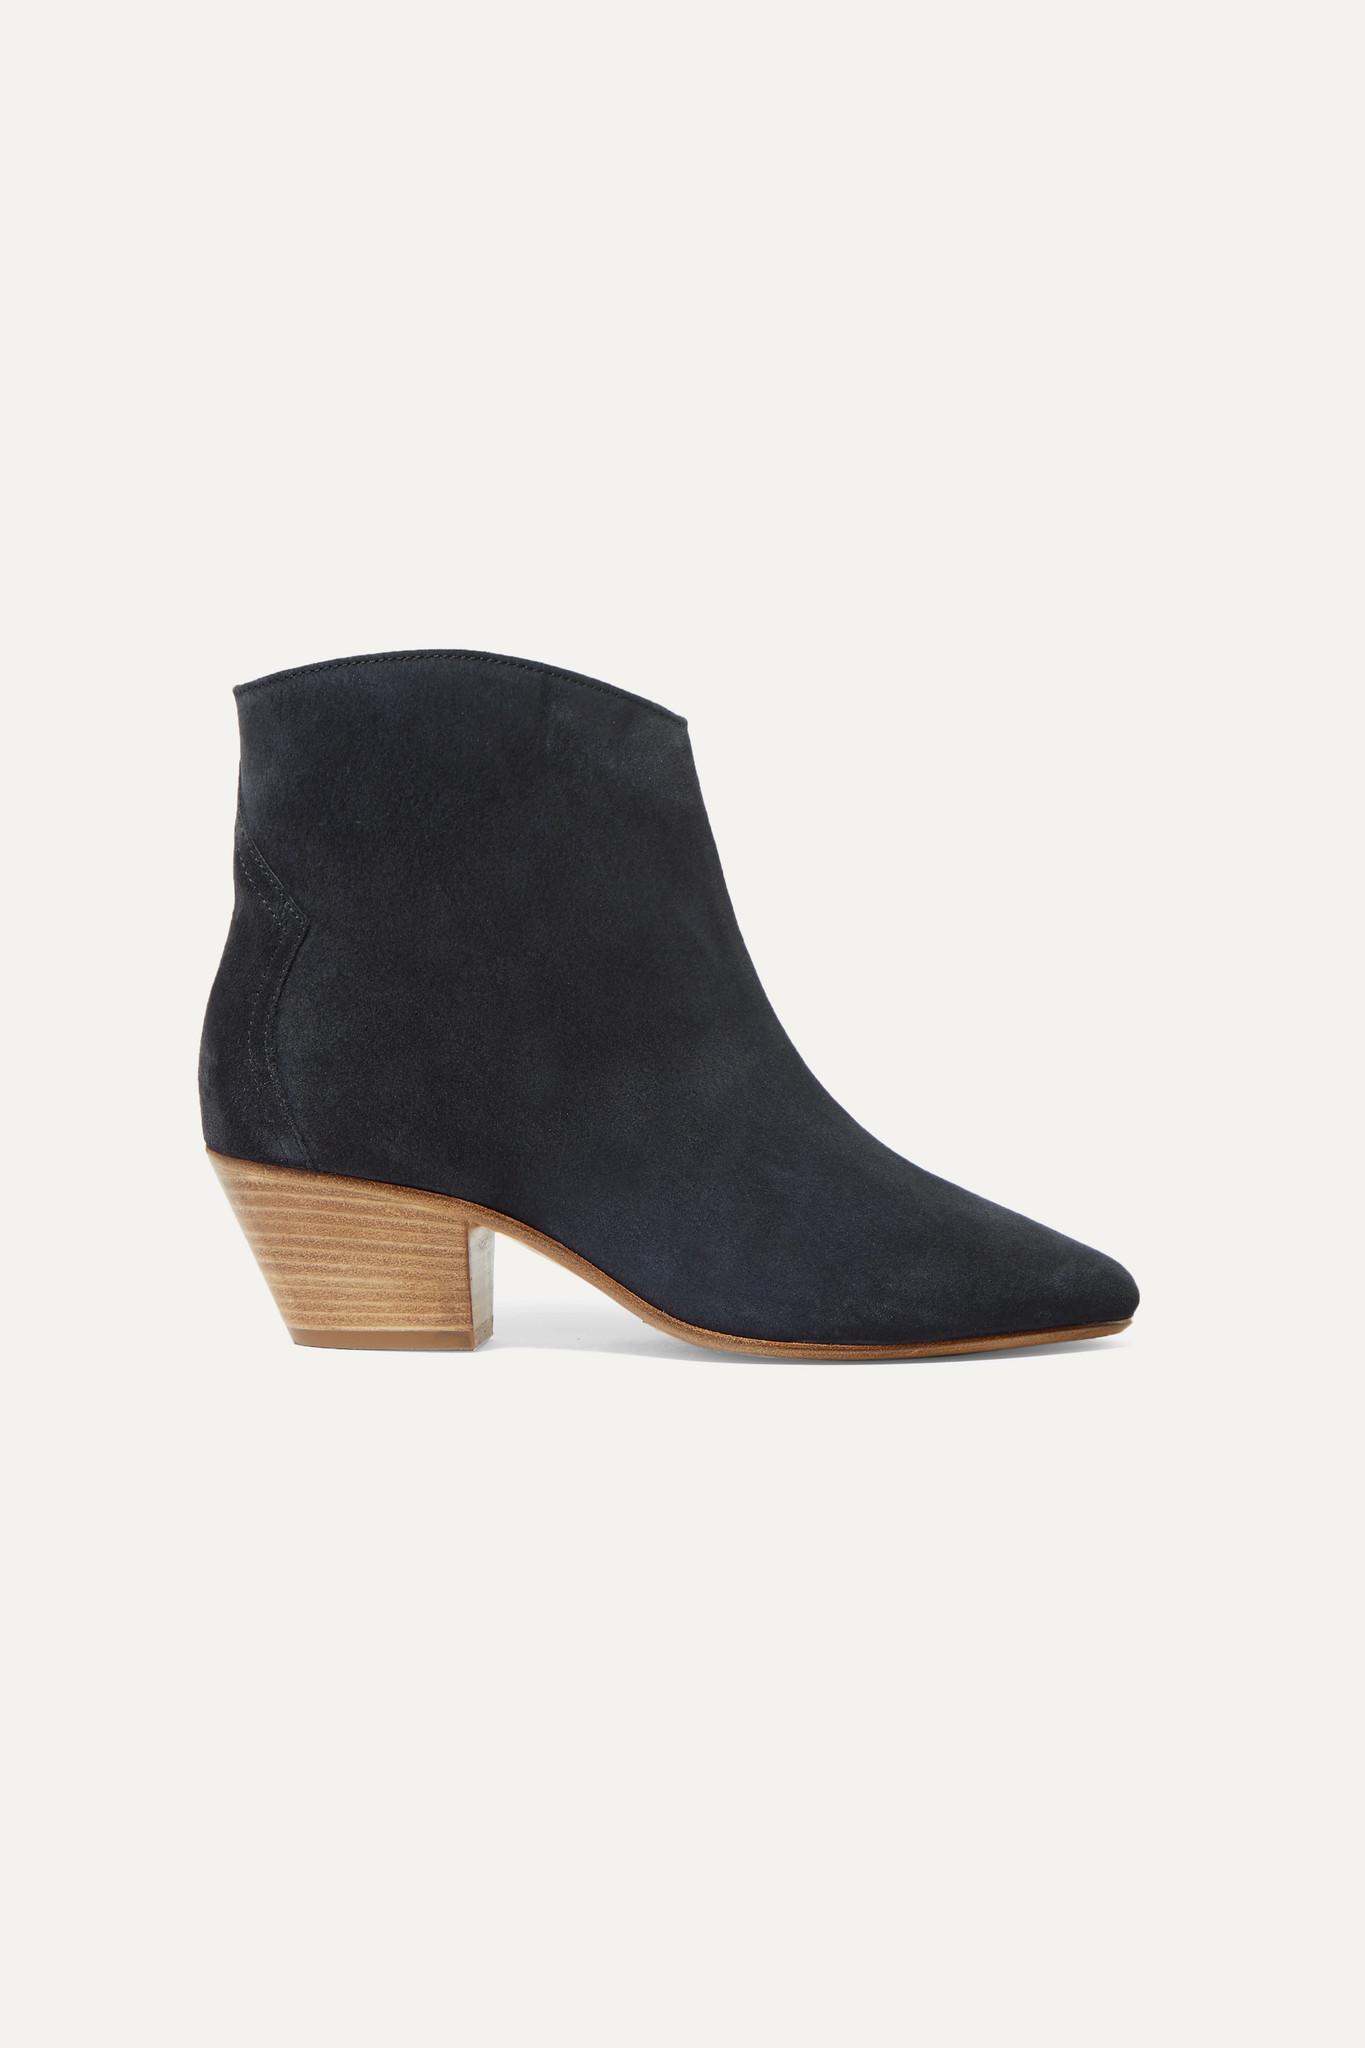 ISABEL MARANT - Dacken 绒面革踝靴 - 黑色 - FR36